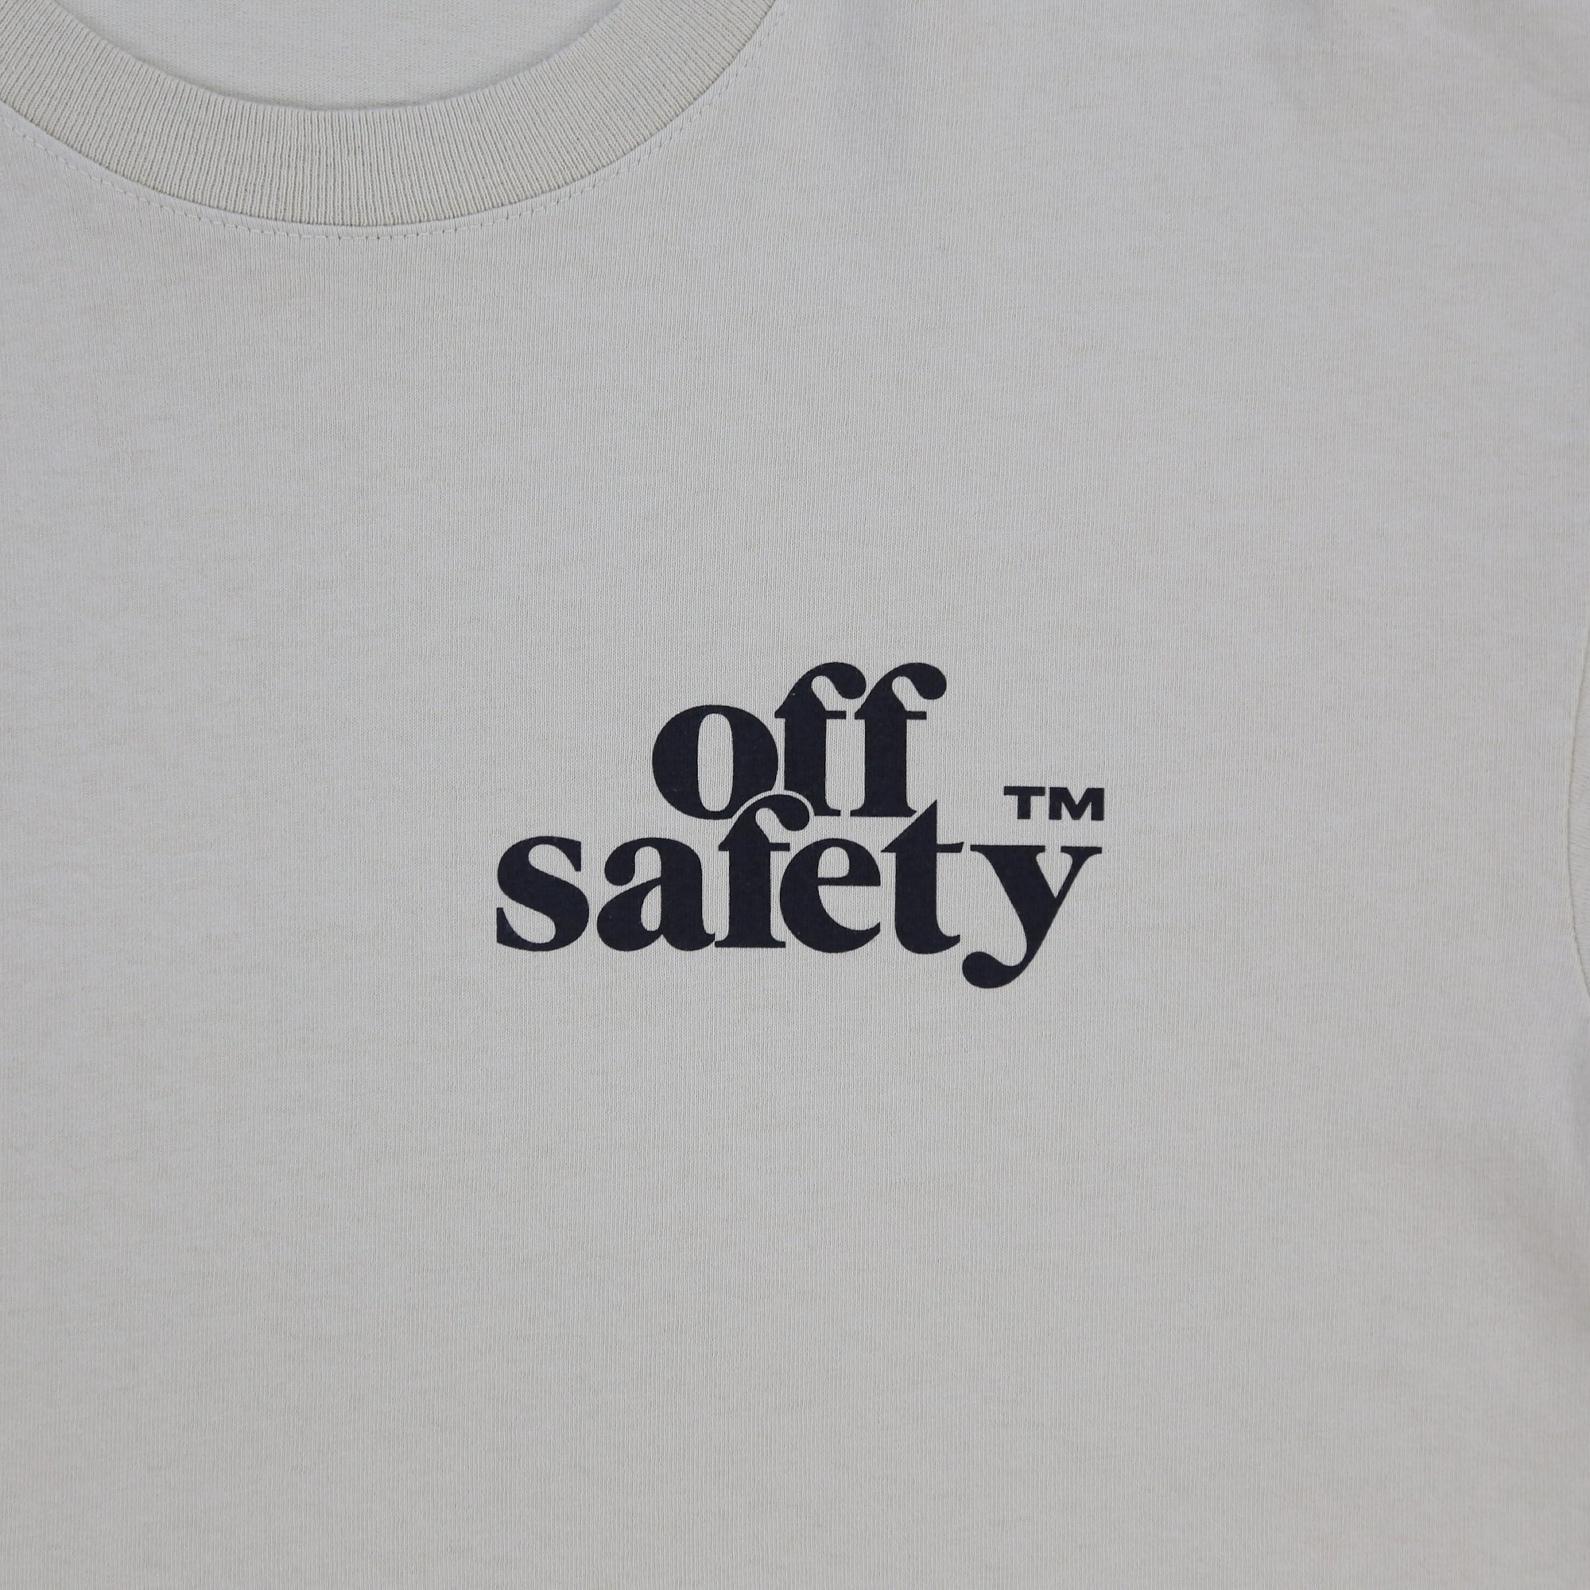 【OFF SAFETY/オフセーフティー】SHOOT FIRST TEE Tシャツ / CREAM